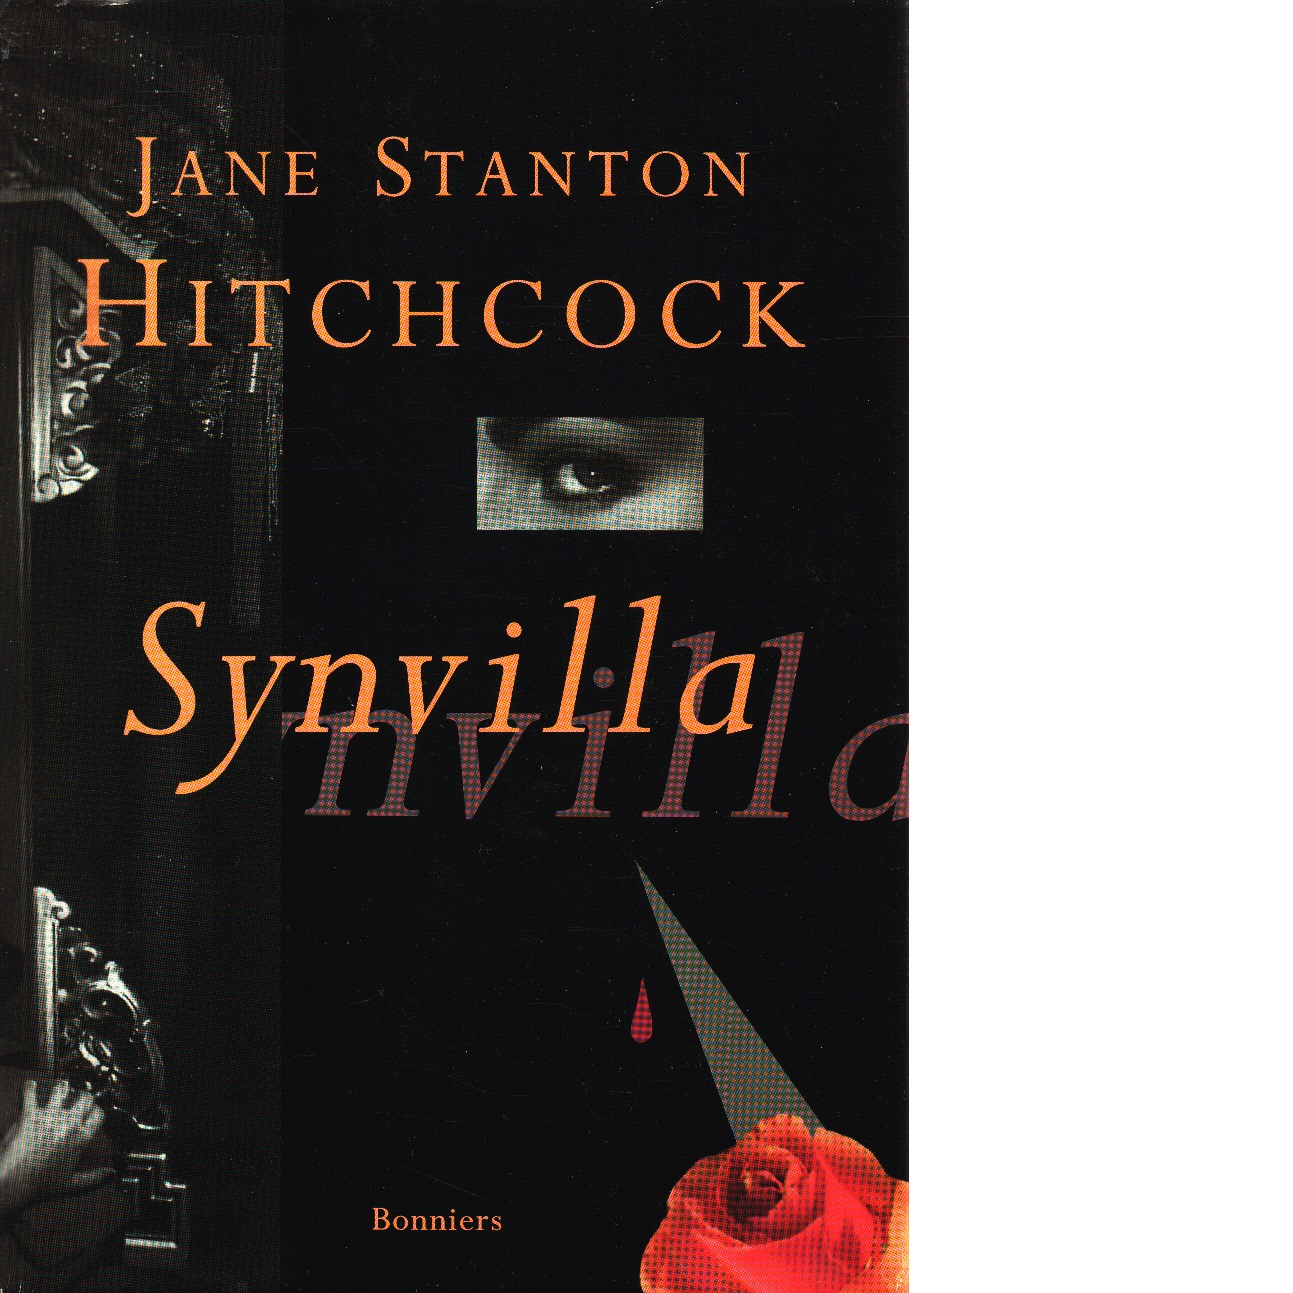 Synvilla - Hitchcock, Jane Stanton